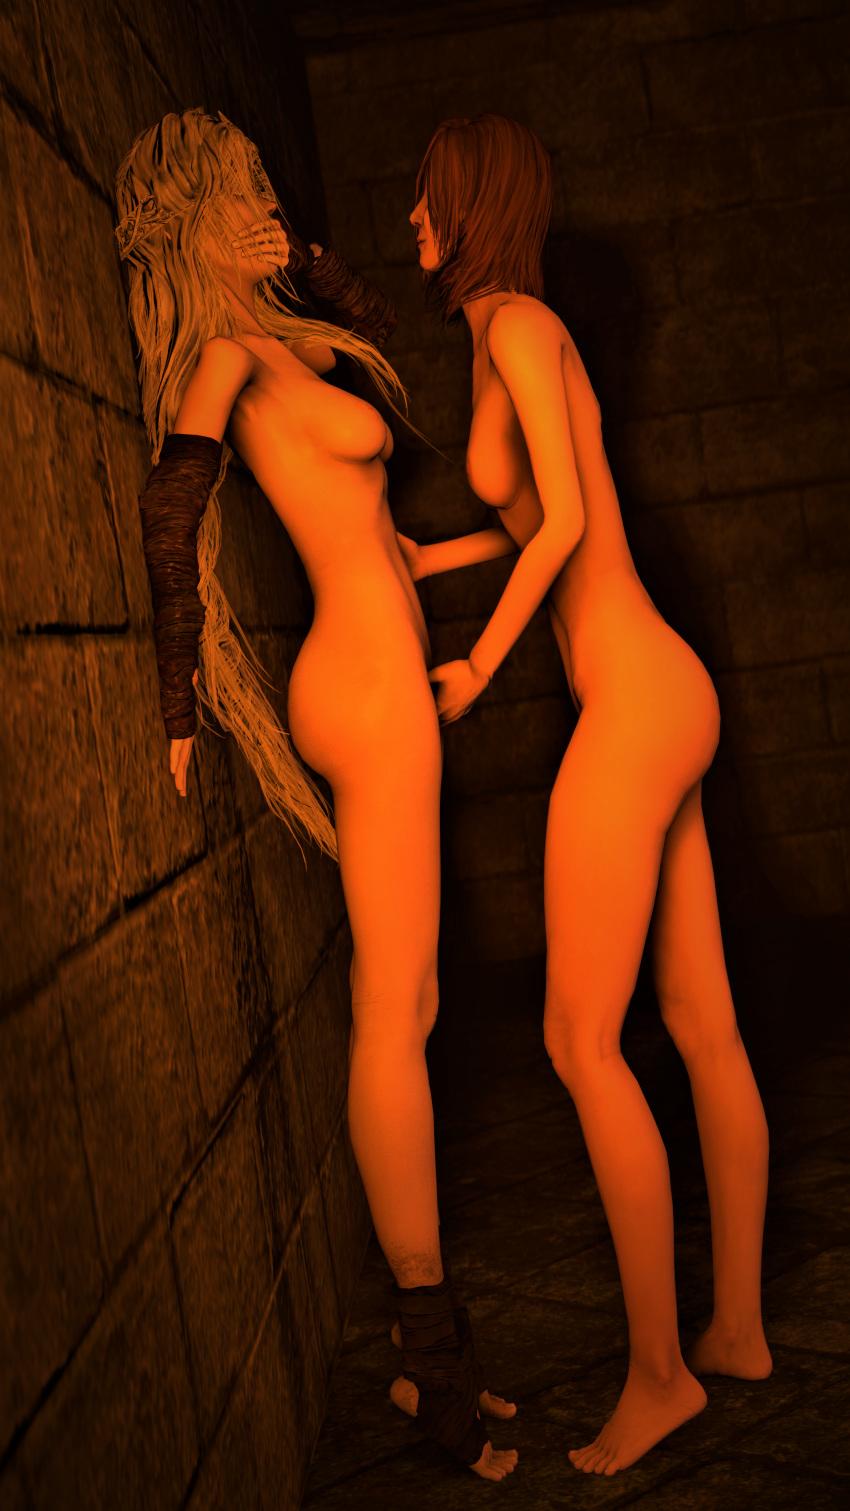 blade dancer souls dark 3 The secret life of pets tiberius